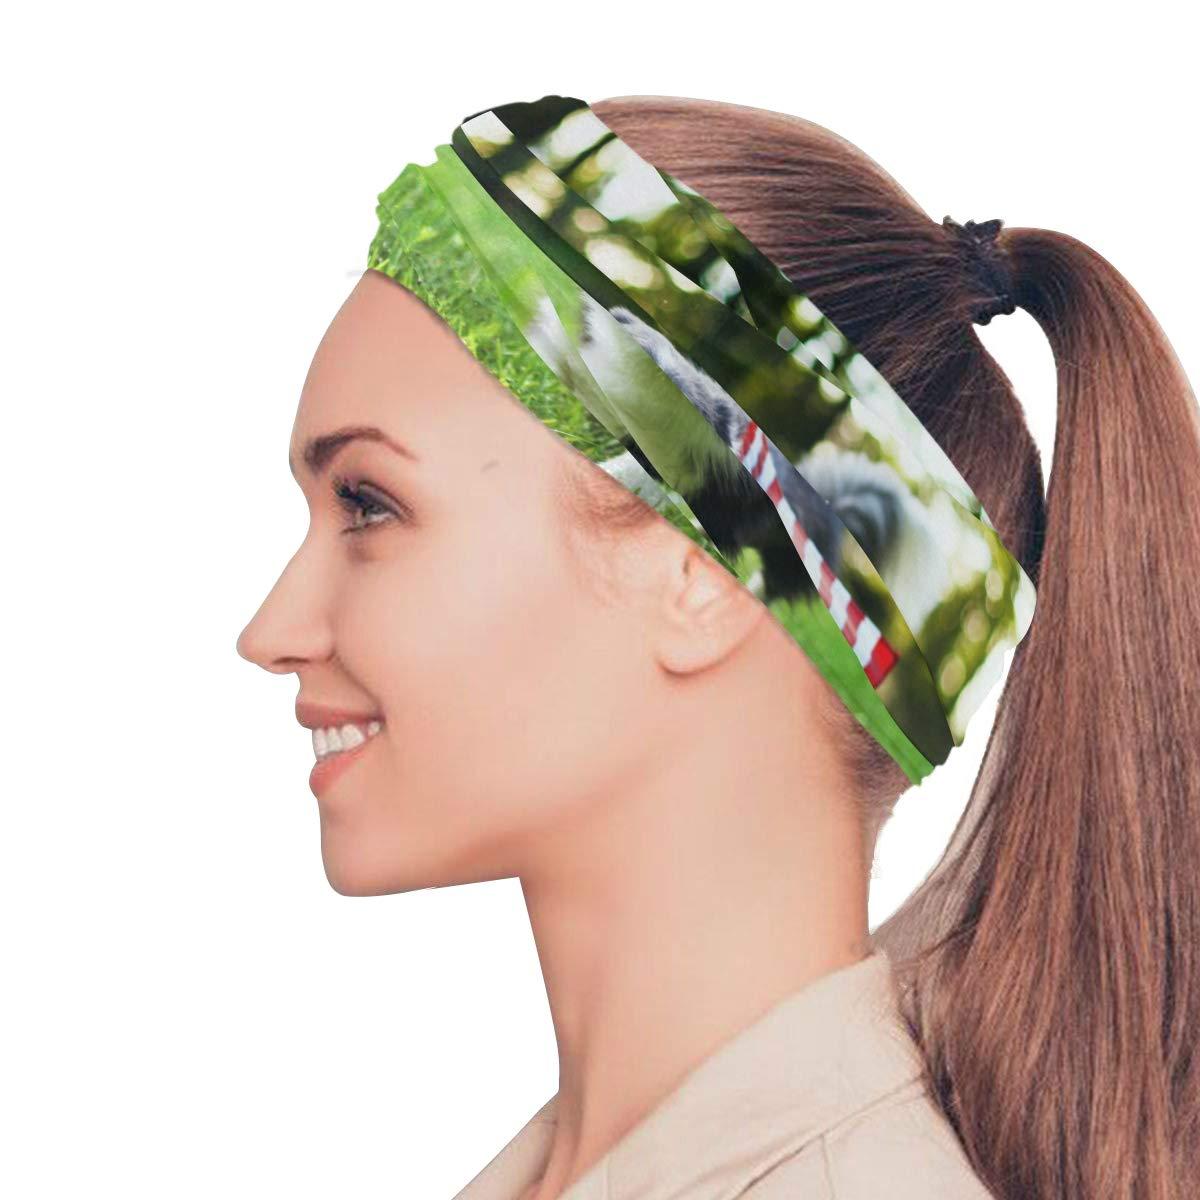 Muffler Magic Neck Gaiter Avocado Green Balaclava Womens Headband Scarf Mens Versatile Bandana Headwrap Headwear